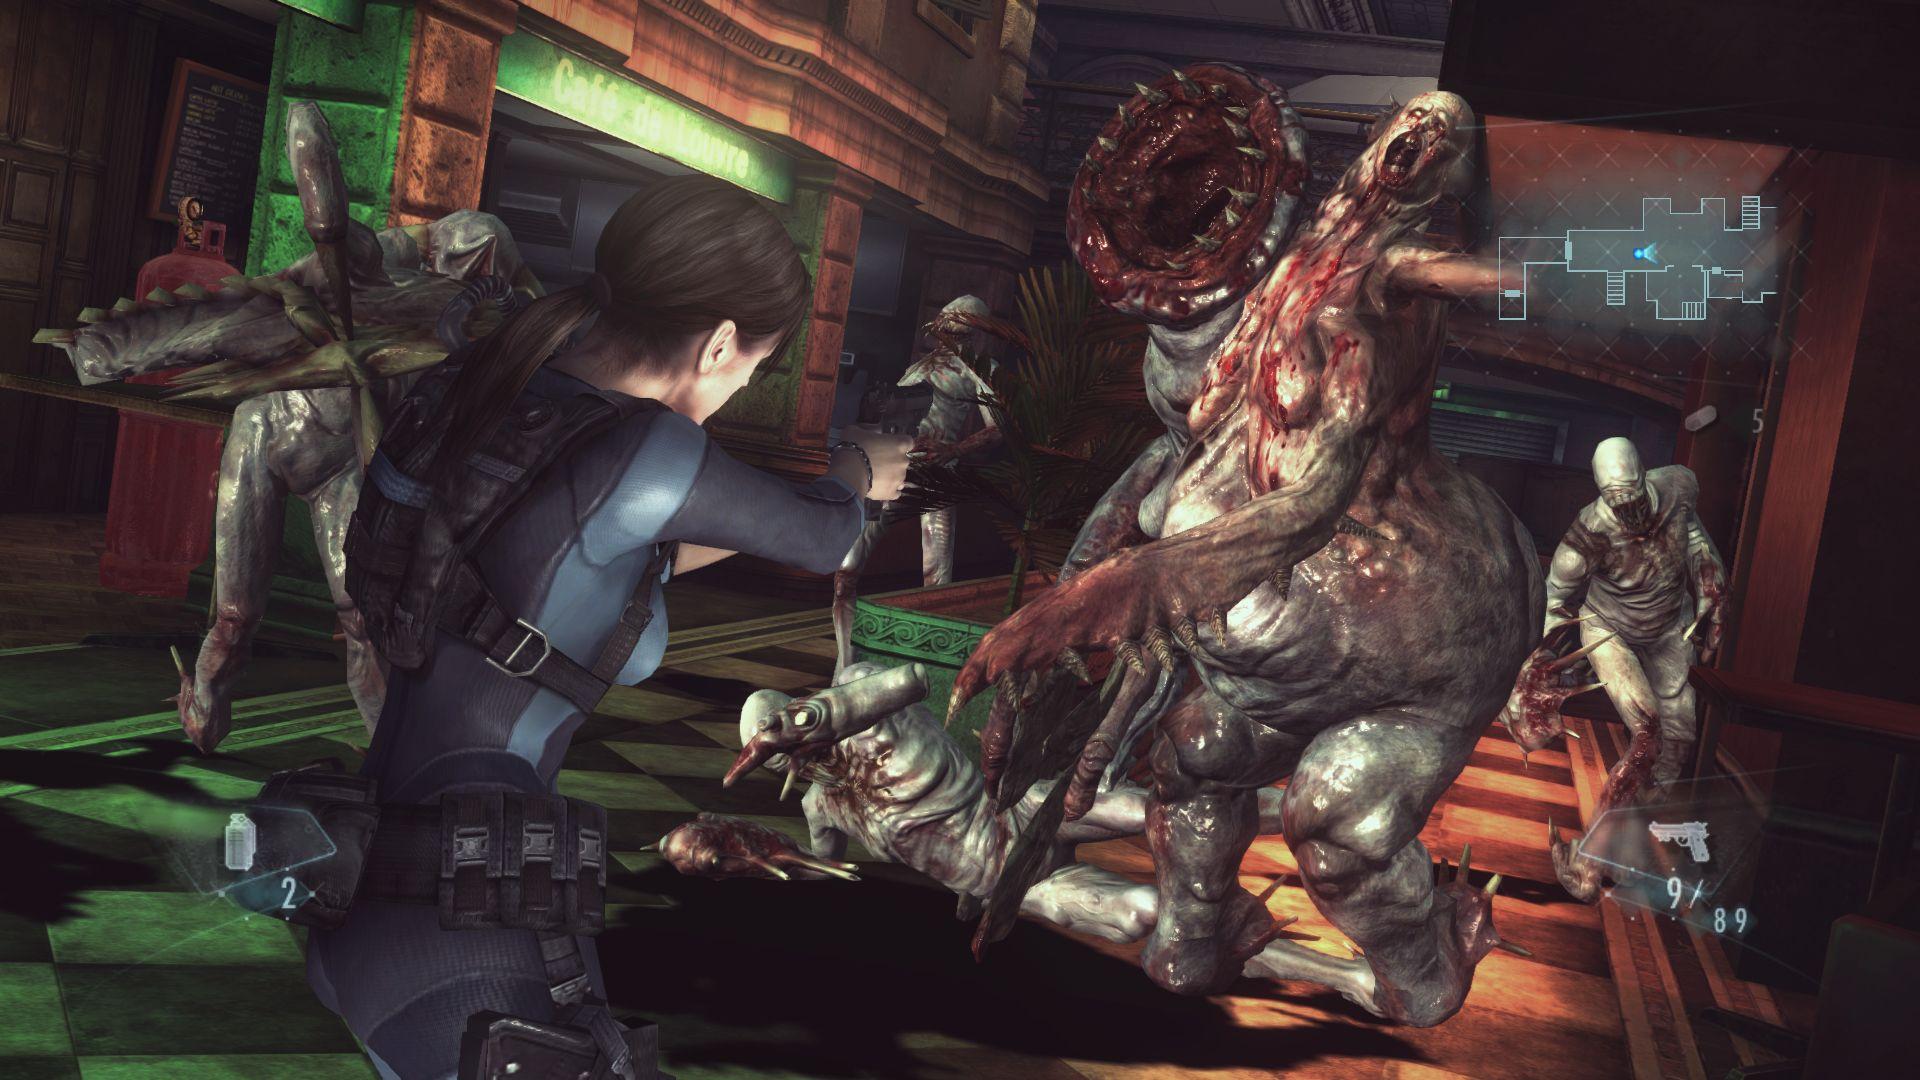 Nadchodzi demo Resident Evil: Revelations; nowe dev diary - obrazek 1